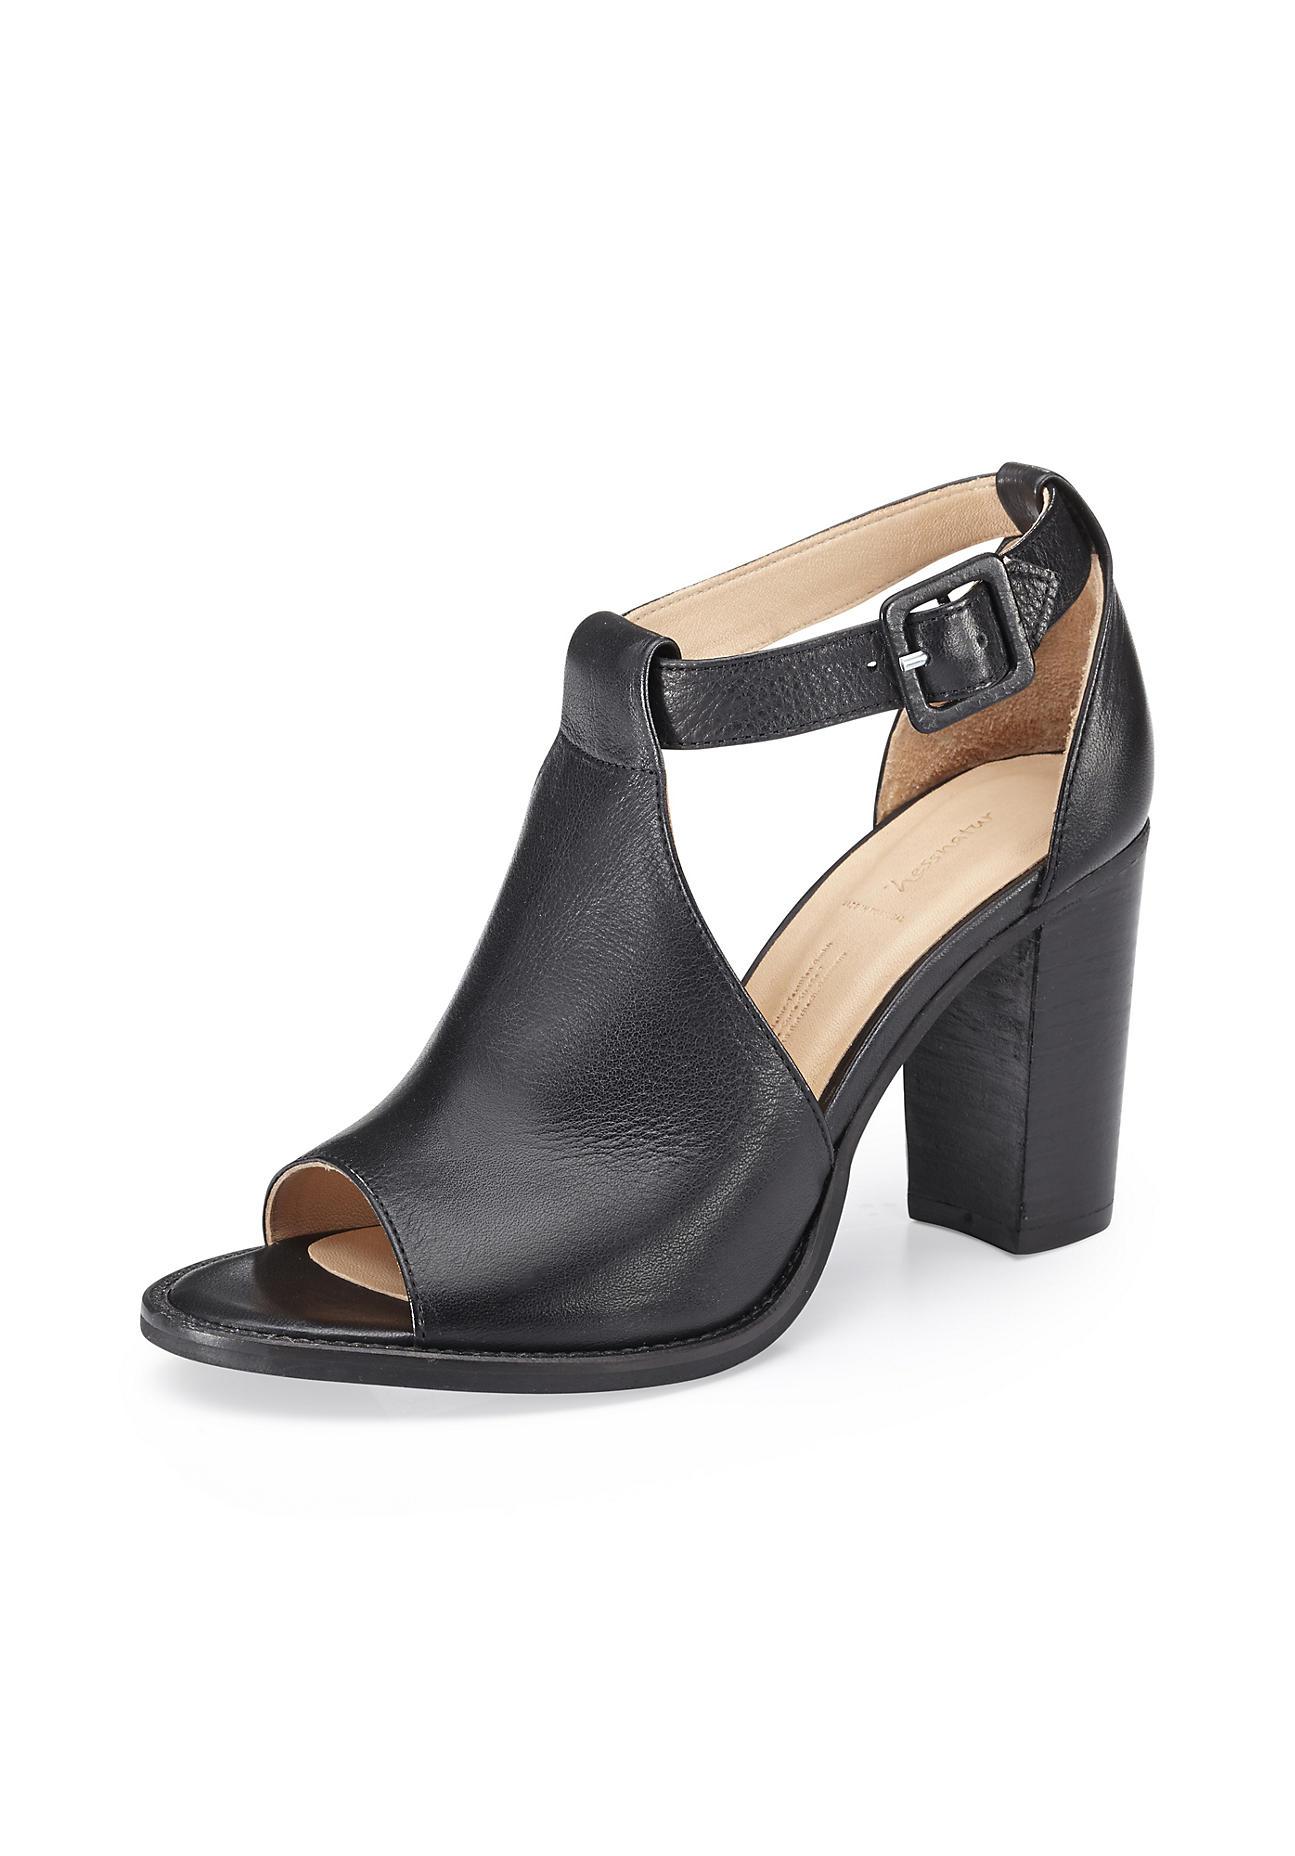 hessnatur Damen Damen Sandalette aus Leder – schwarz – Größe 39